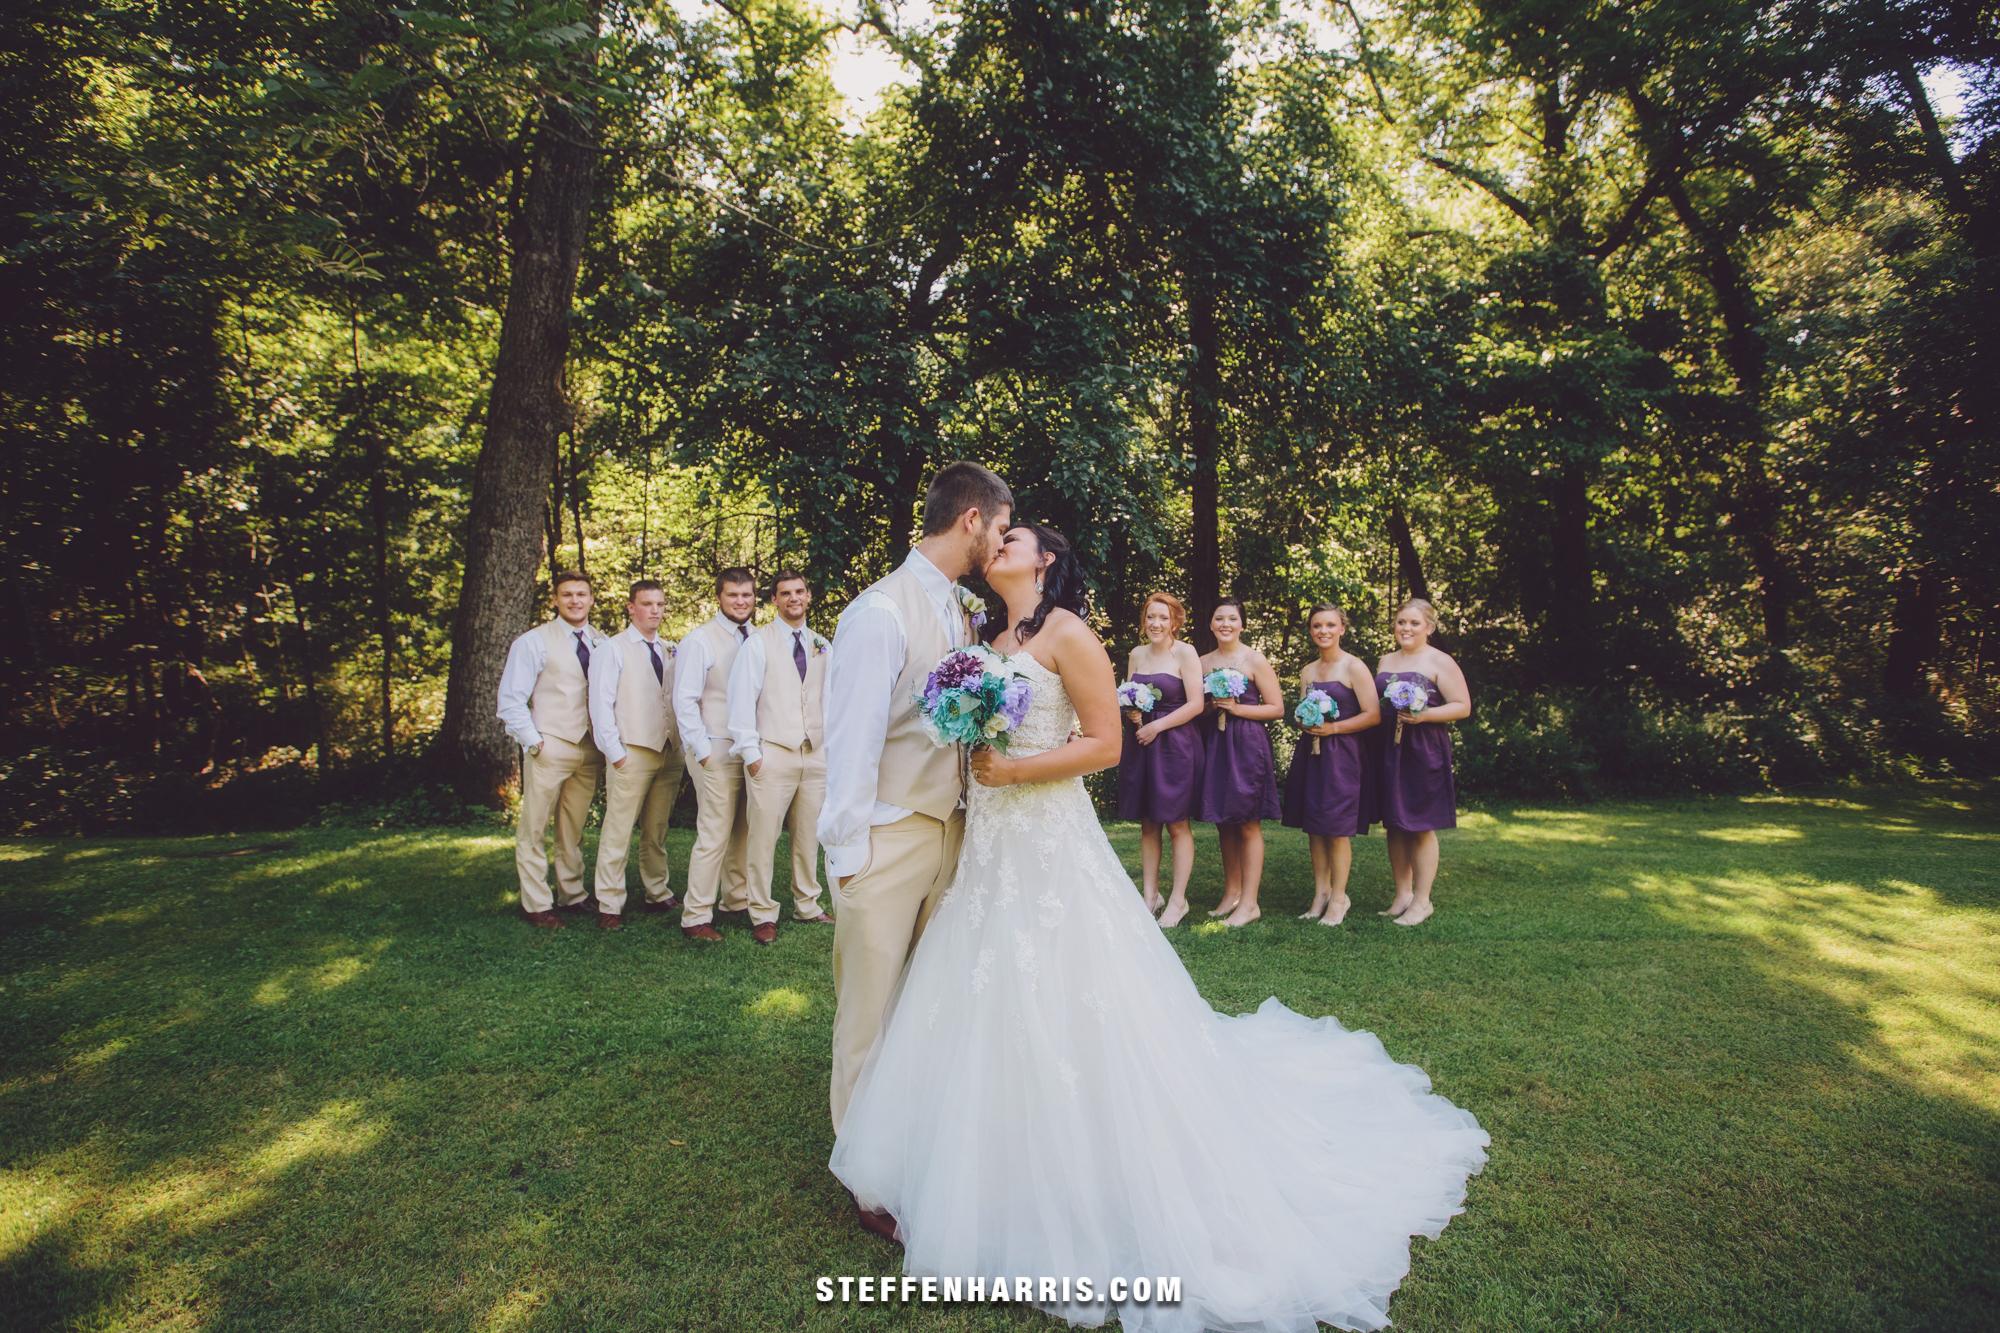 casey-aaron-salem-il-wedding-photography-33